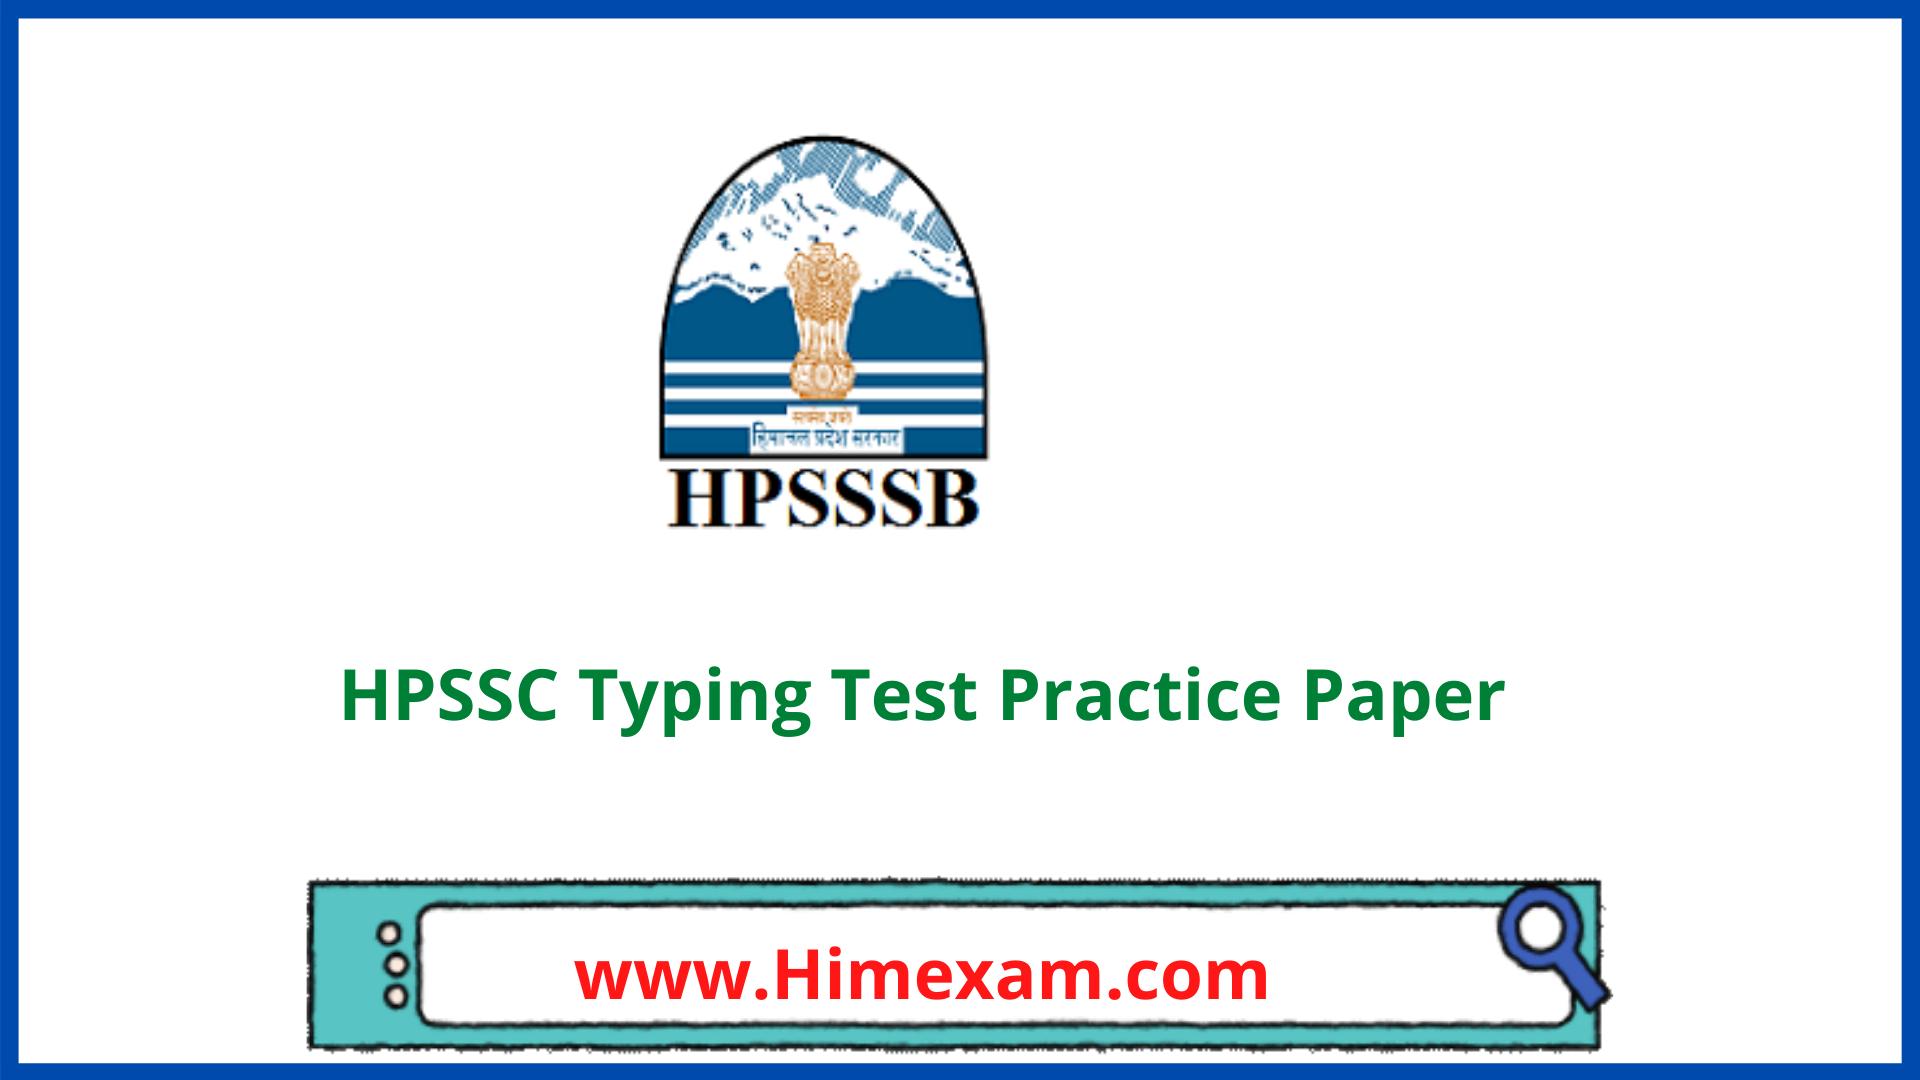 HPSSC Typing Test Practice Paper